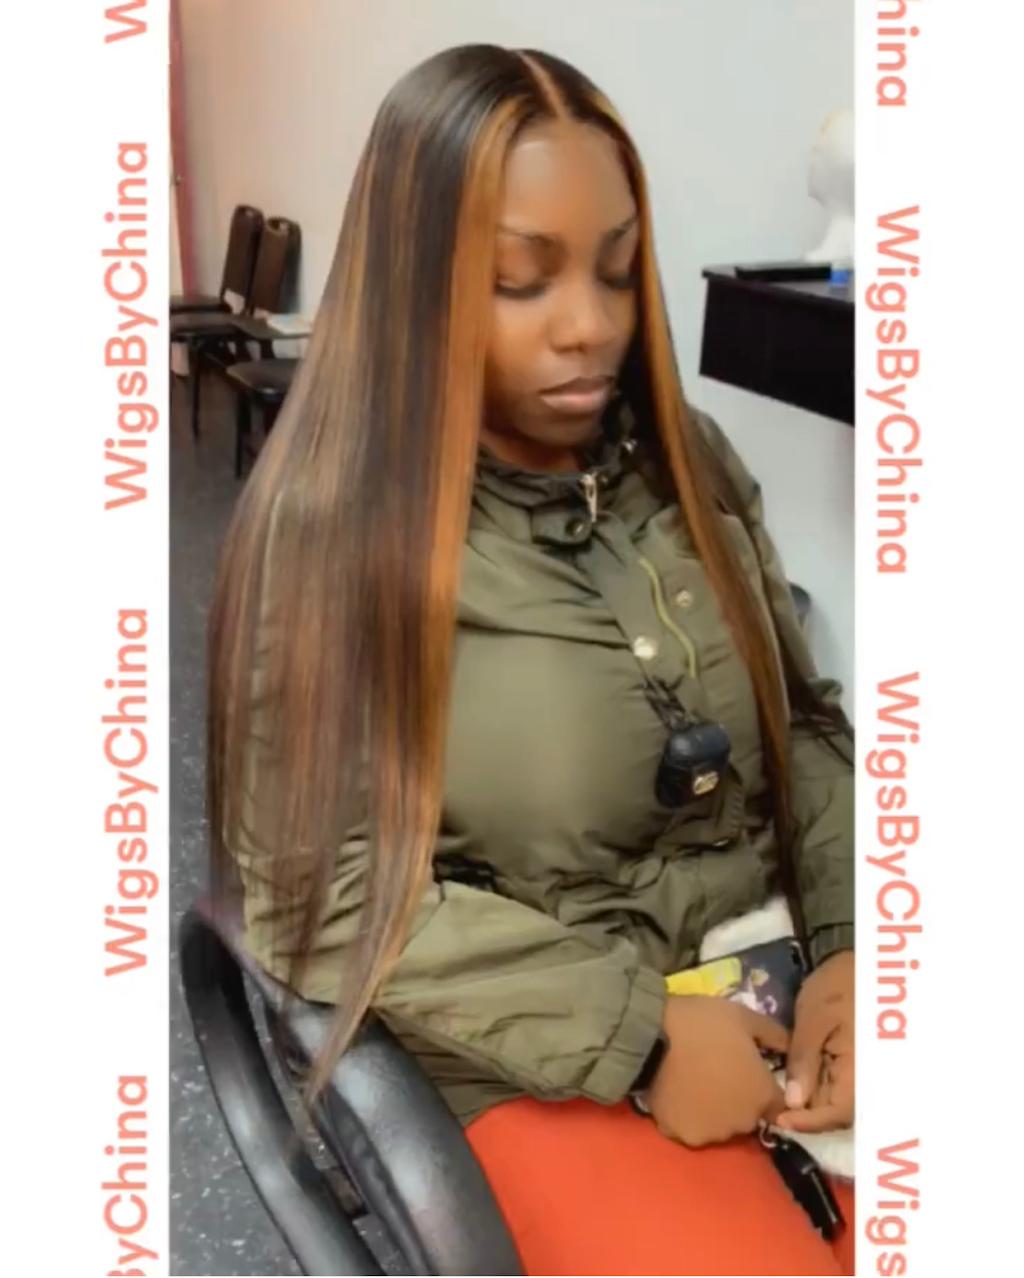 GLAM Salon & Boutique - hair care    Photo 2 of 2   Address: 22340 Lakeshore Blvd, Euclid, OH 44123, USA   Phone: (216) 939-6230